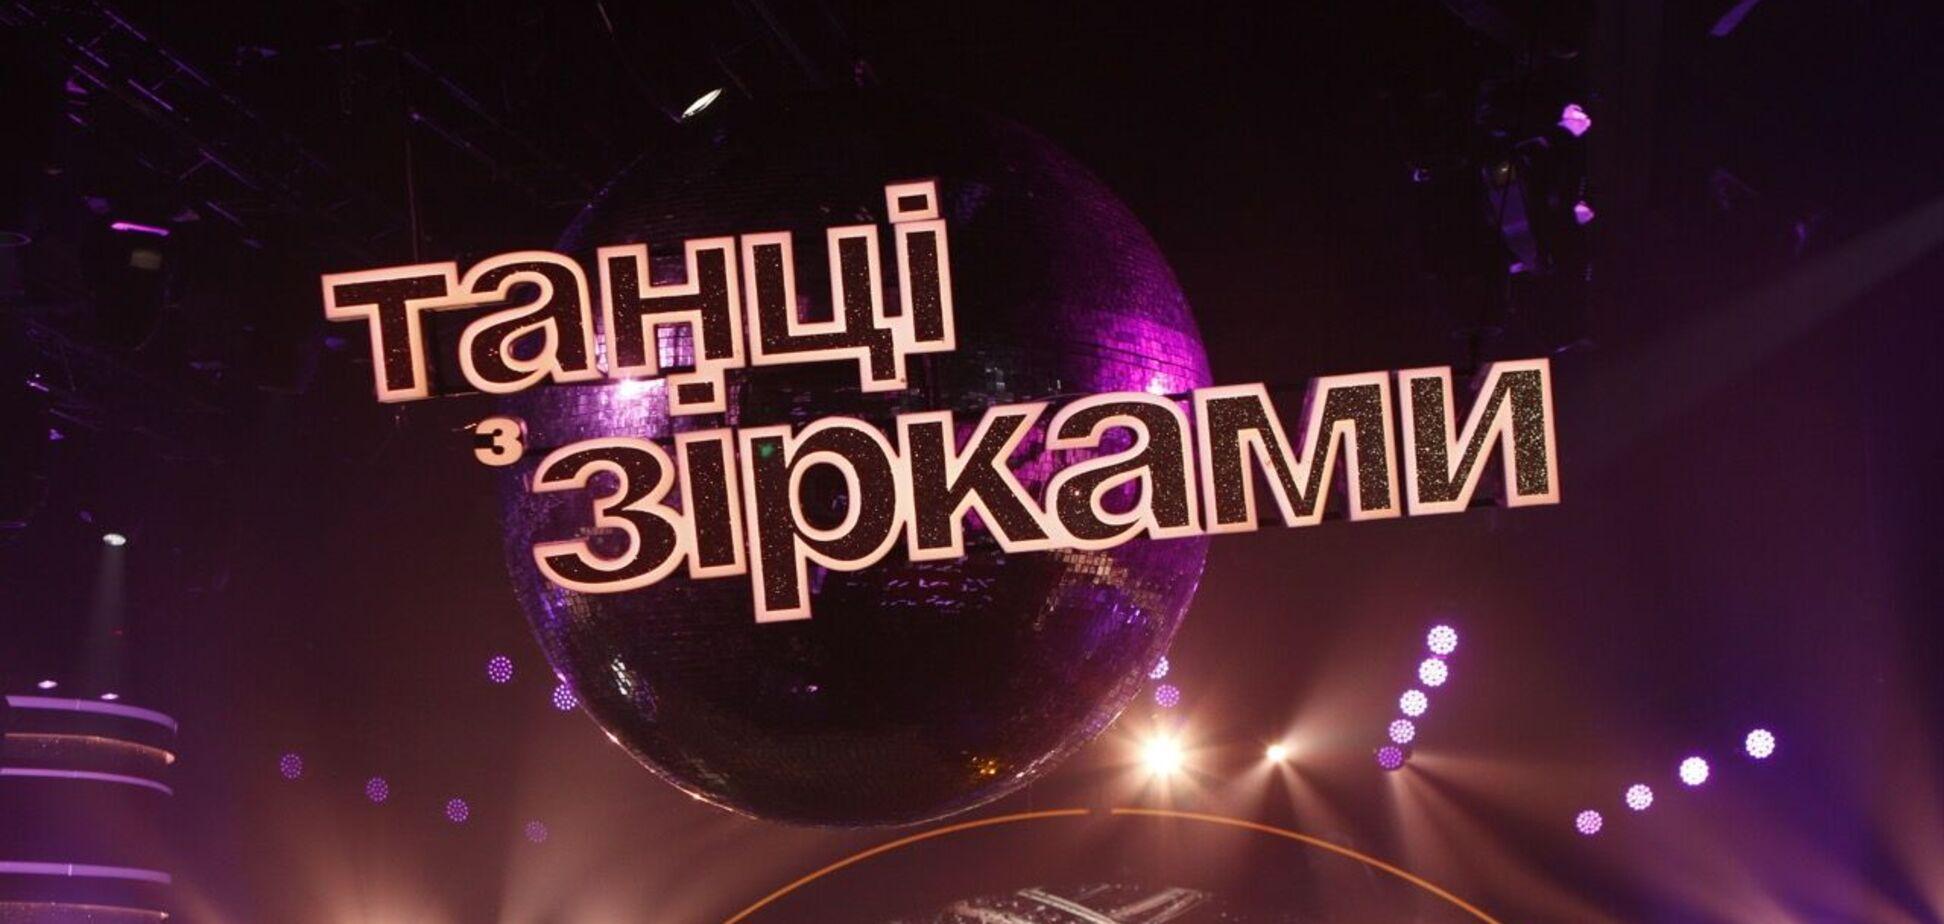 Результаты полуфинала 'Танців з зірками' спровоцировали скандал в сети